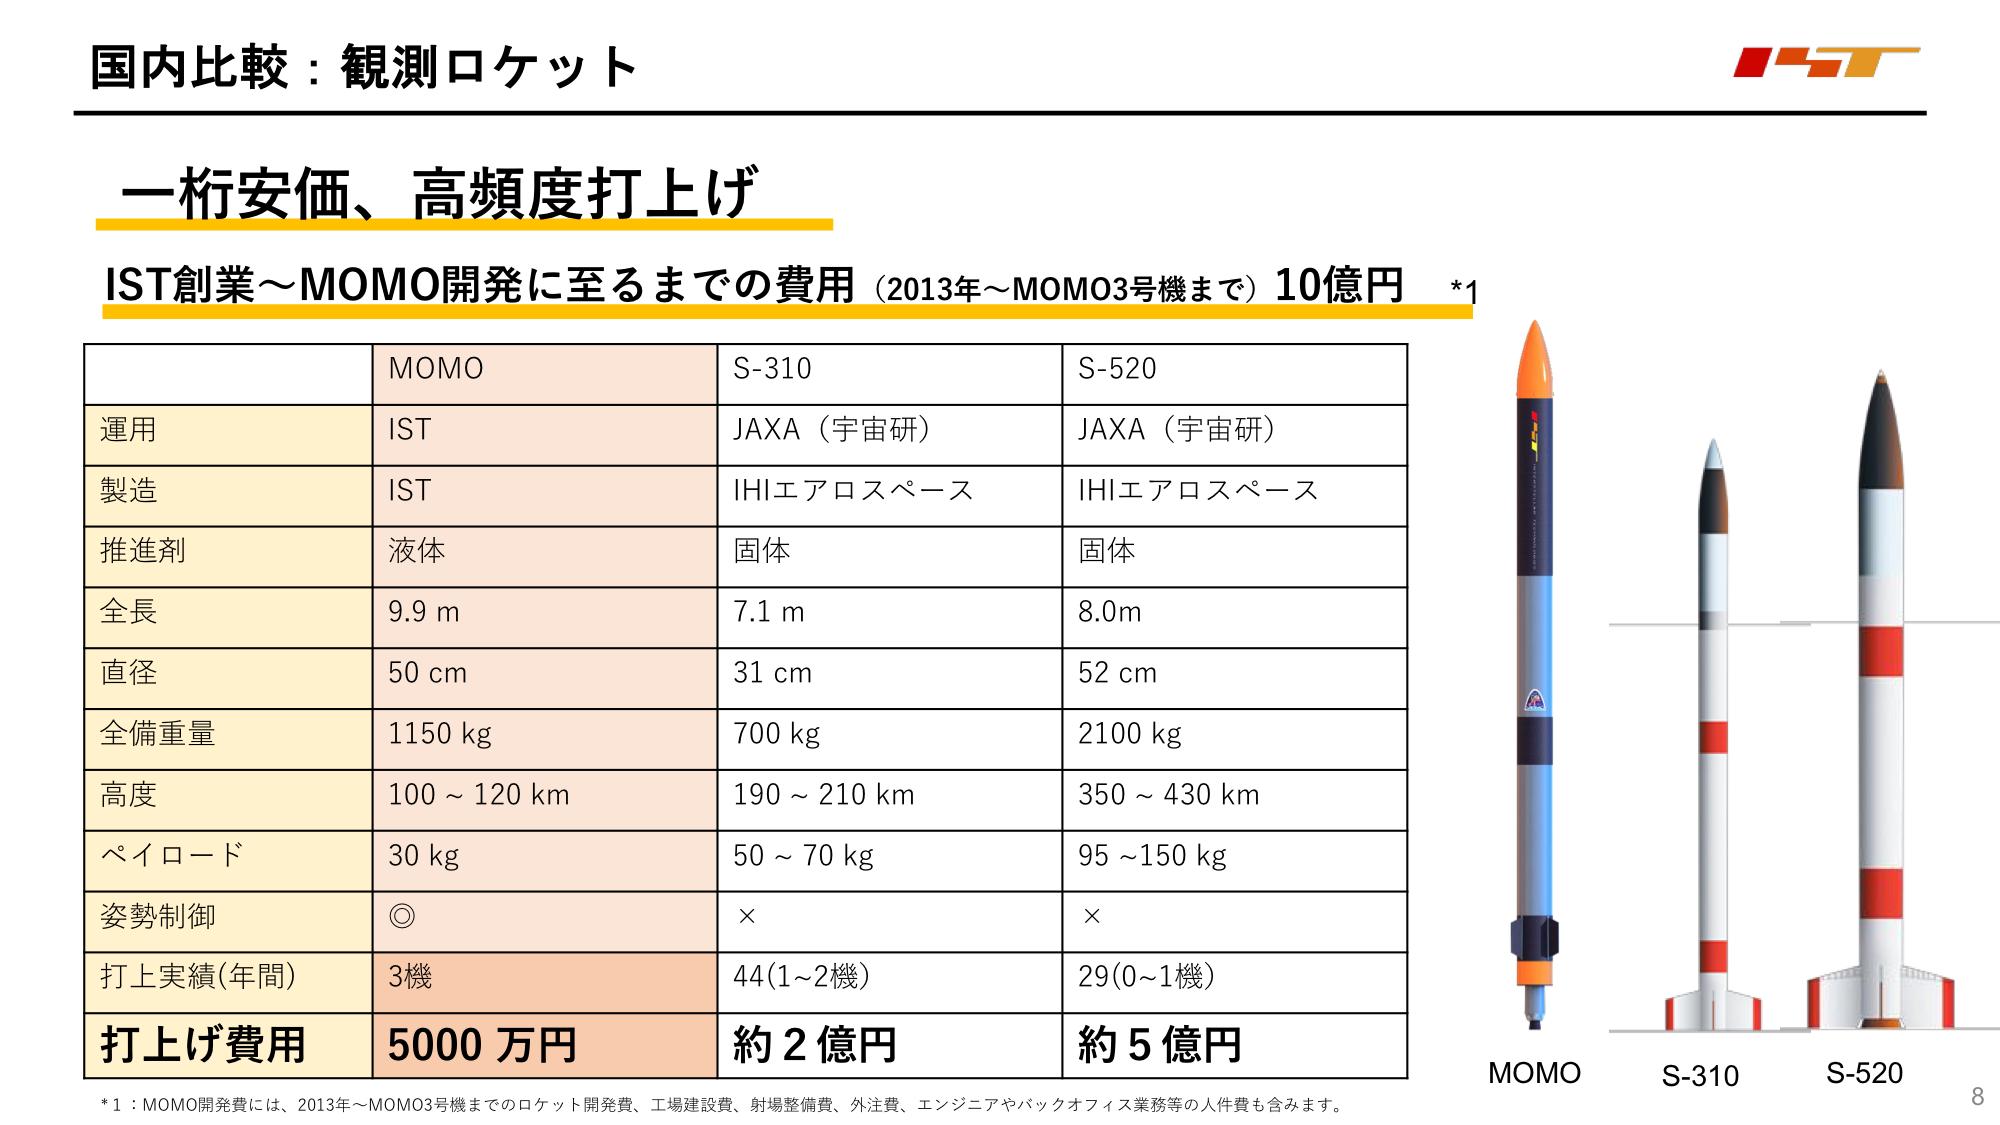 f:id:Imamura:20200603232749p:plain